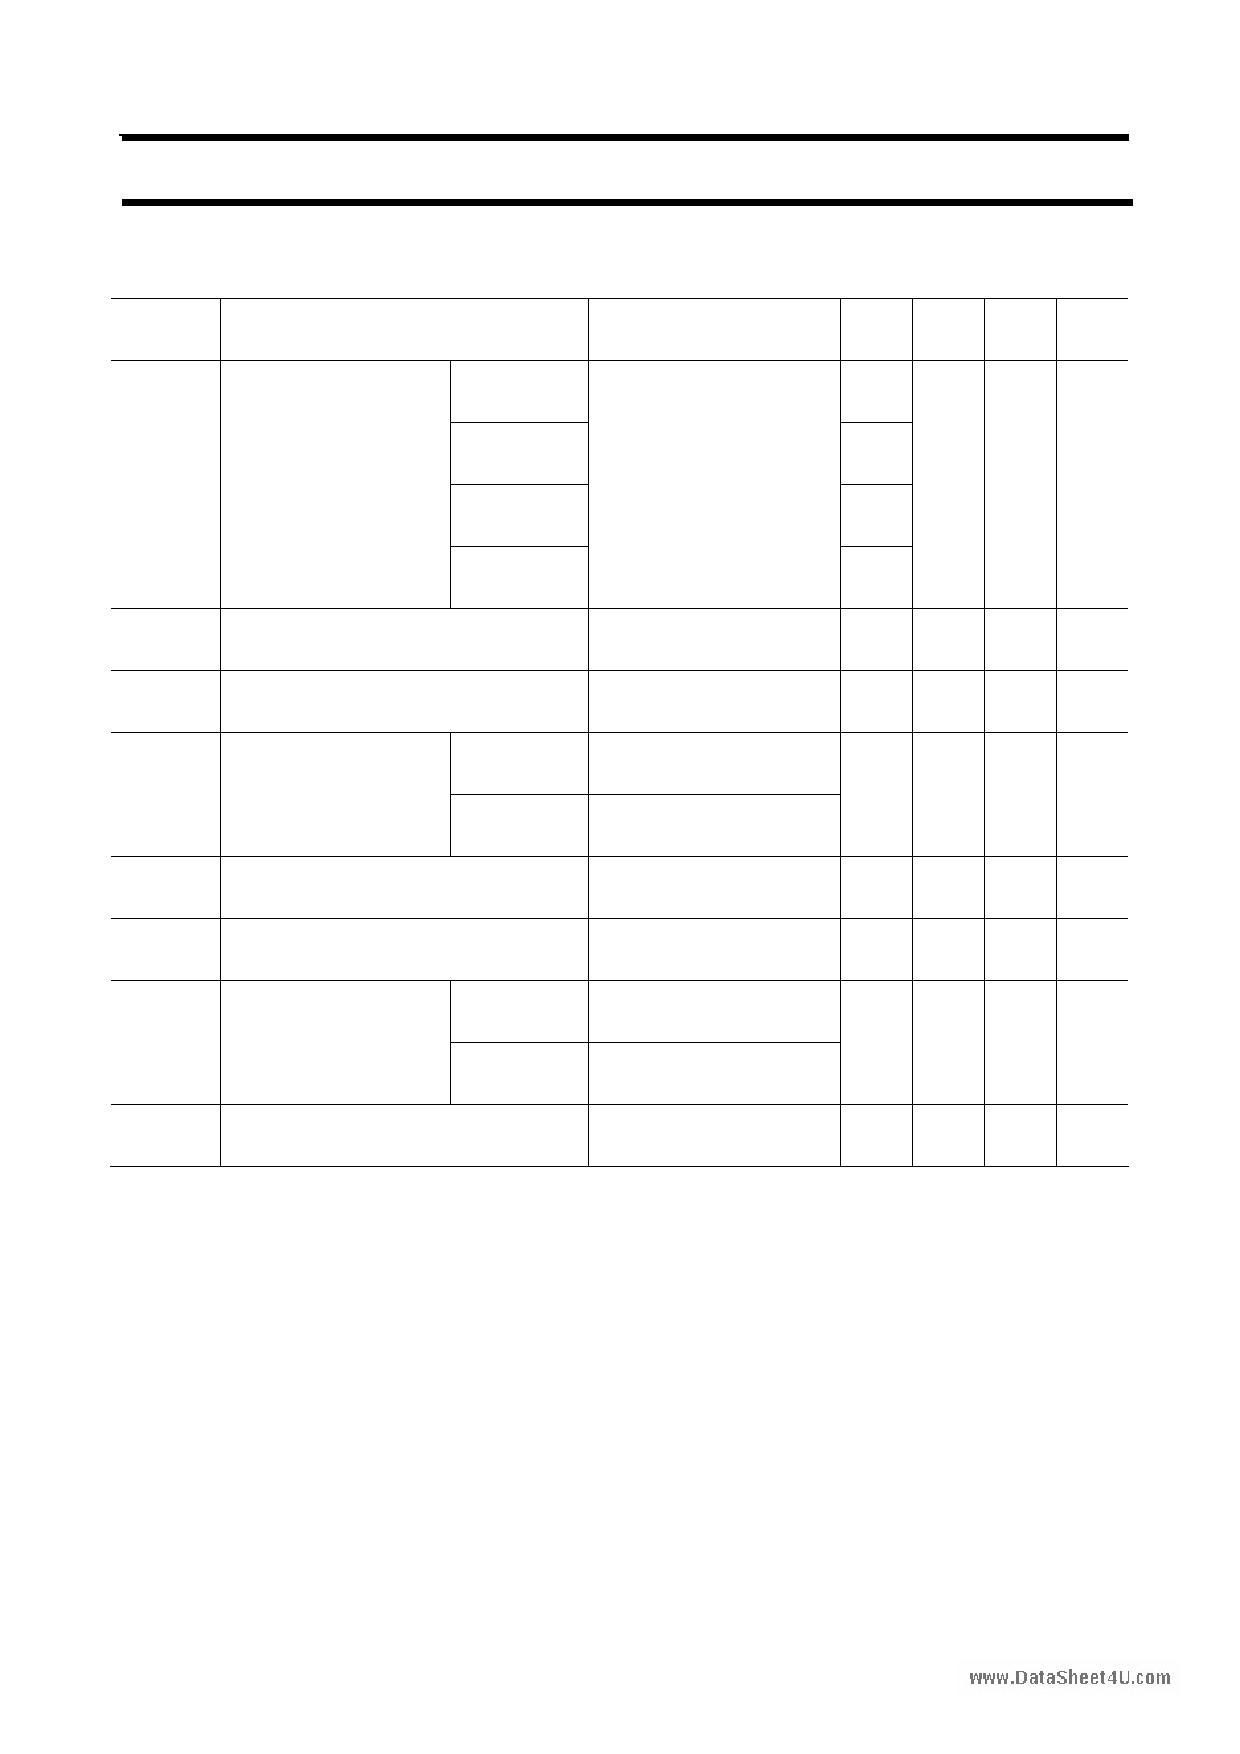 2N6099 data sheet